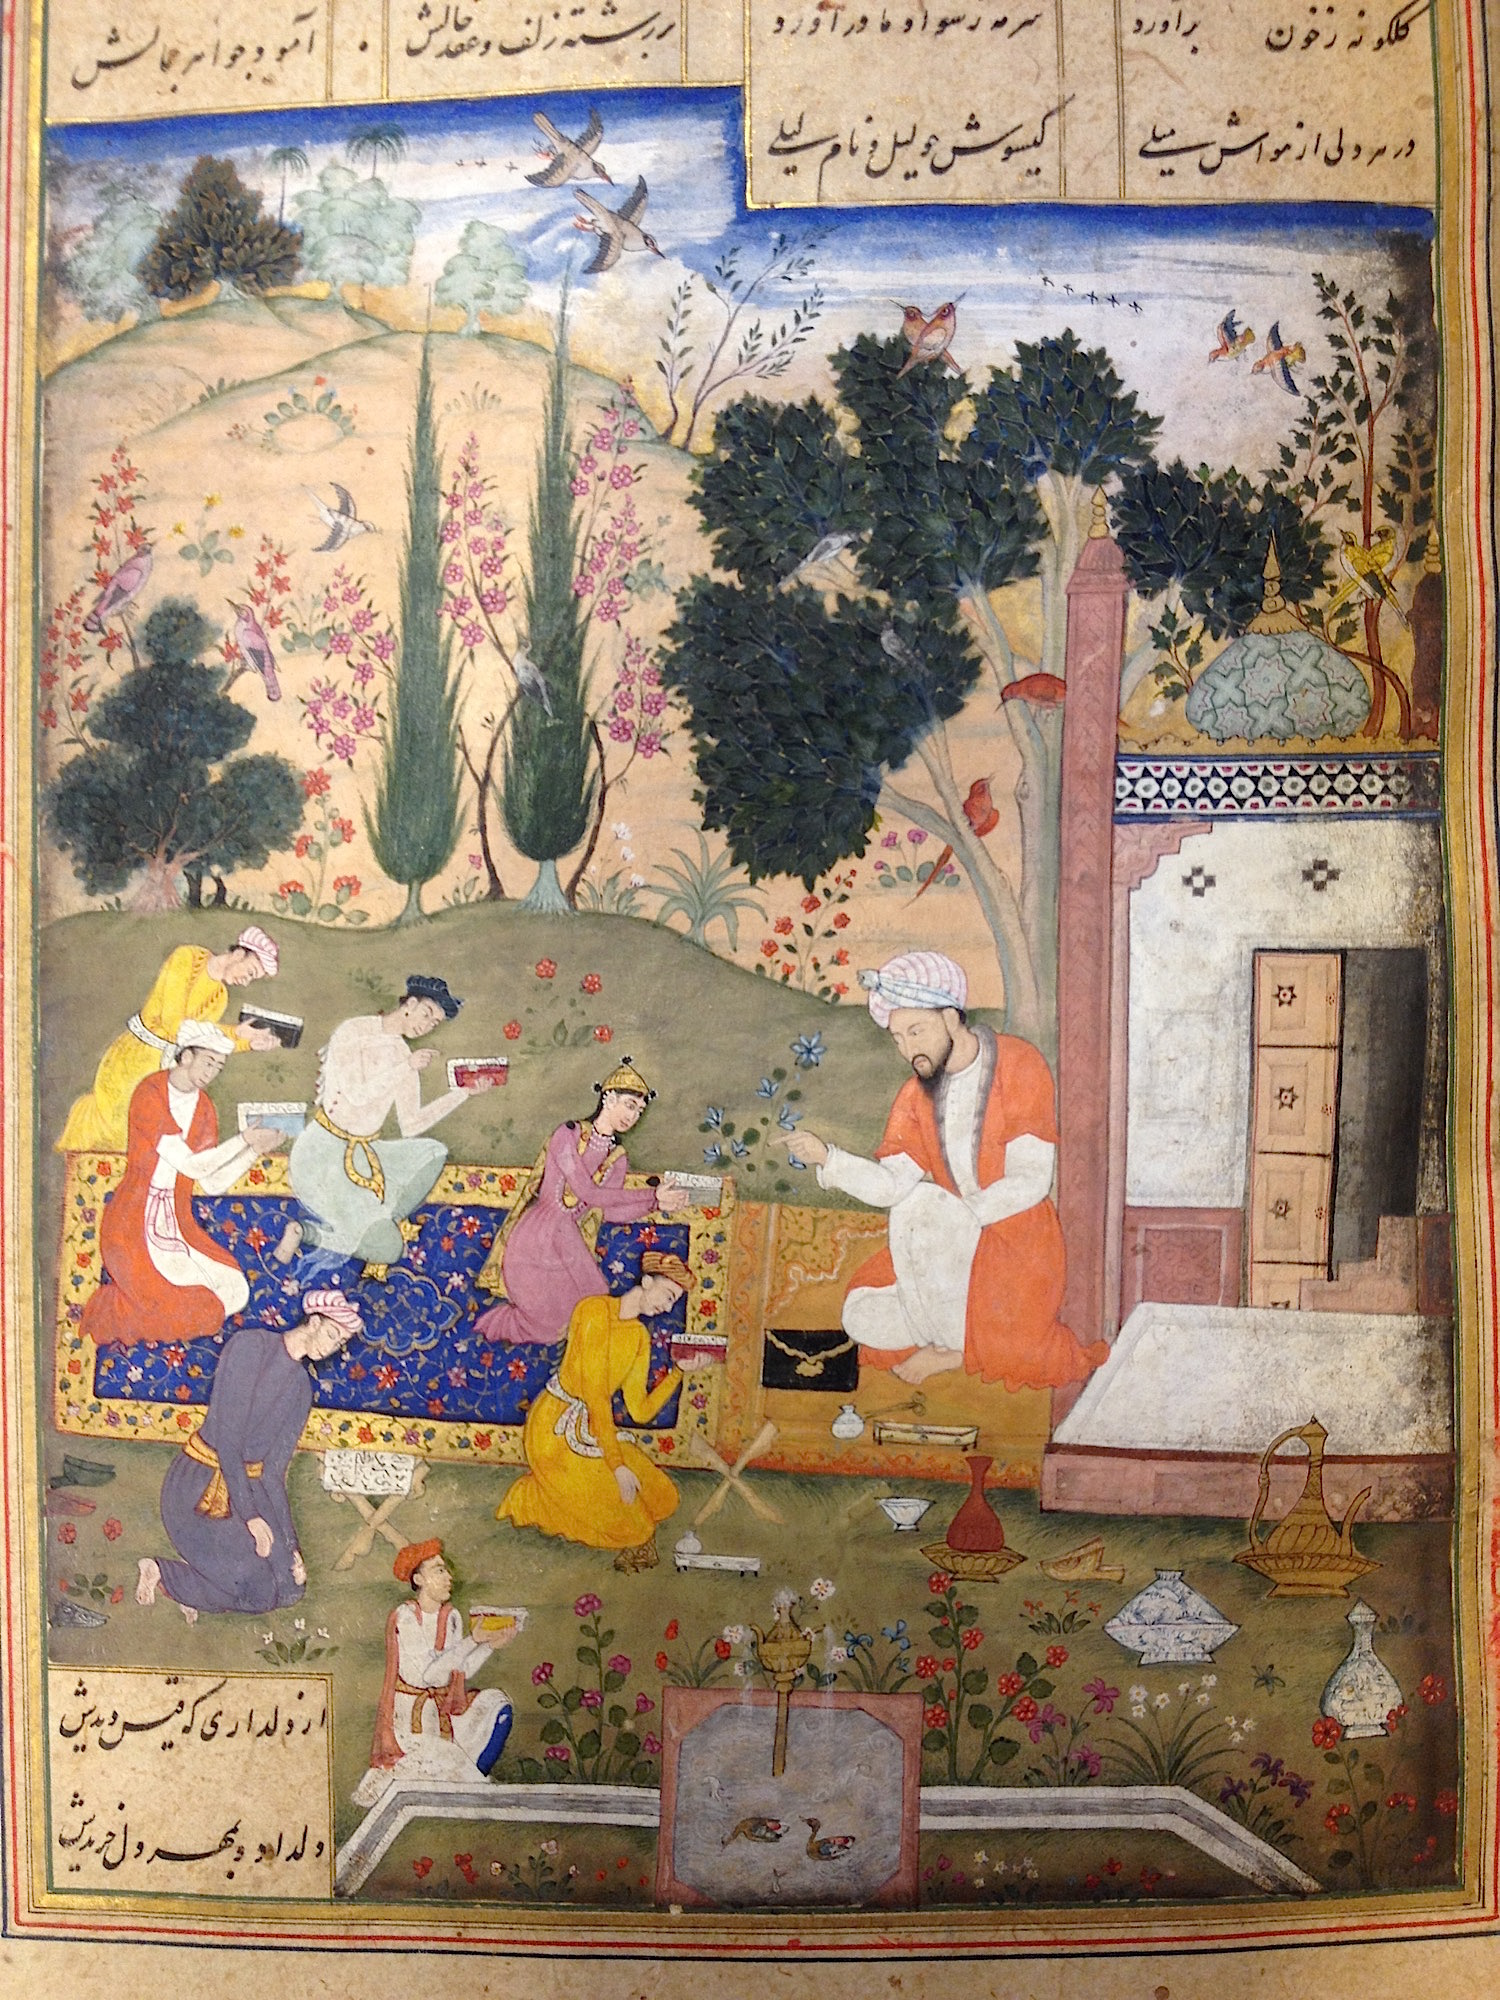 Layla and Majnun as children at school (British Library IO Islamic 384, f. 7r) [Licensed under Public Domain]